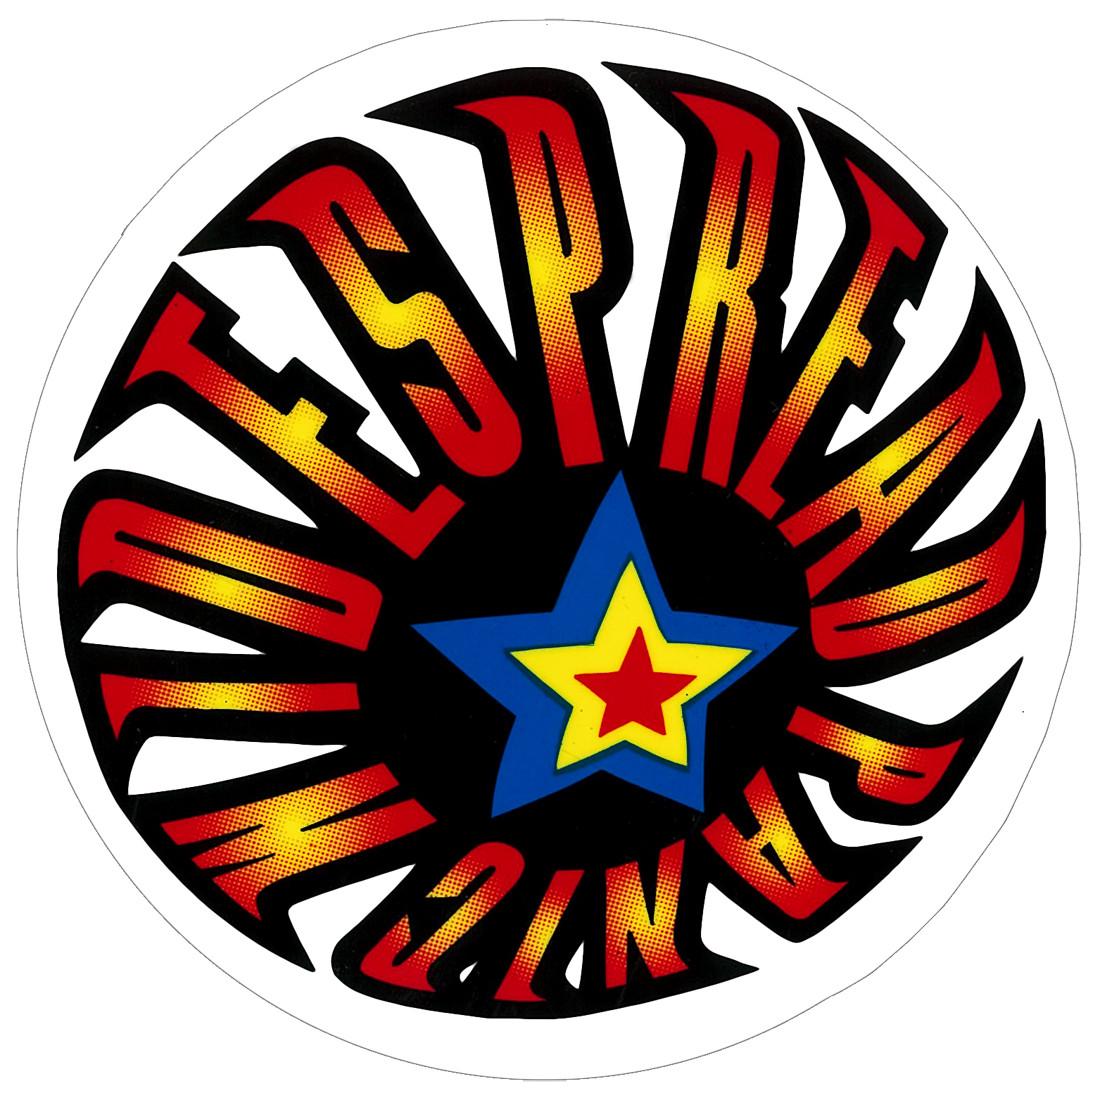 Widespread Panic Fireball Sticker